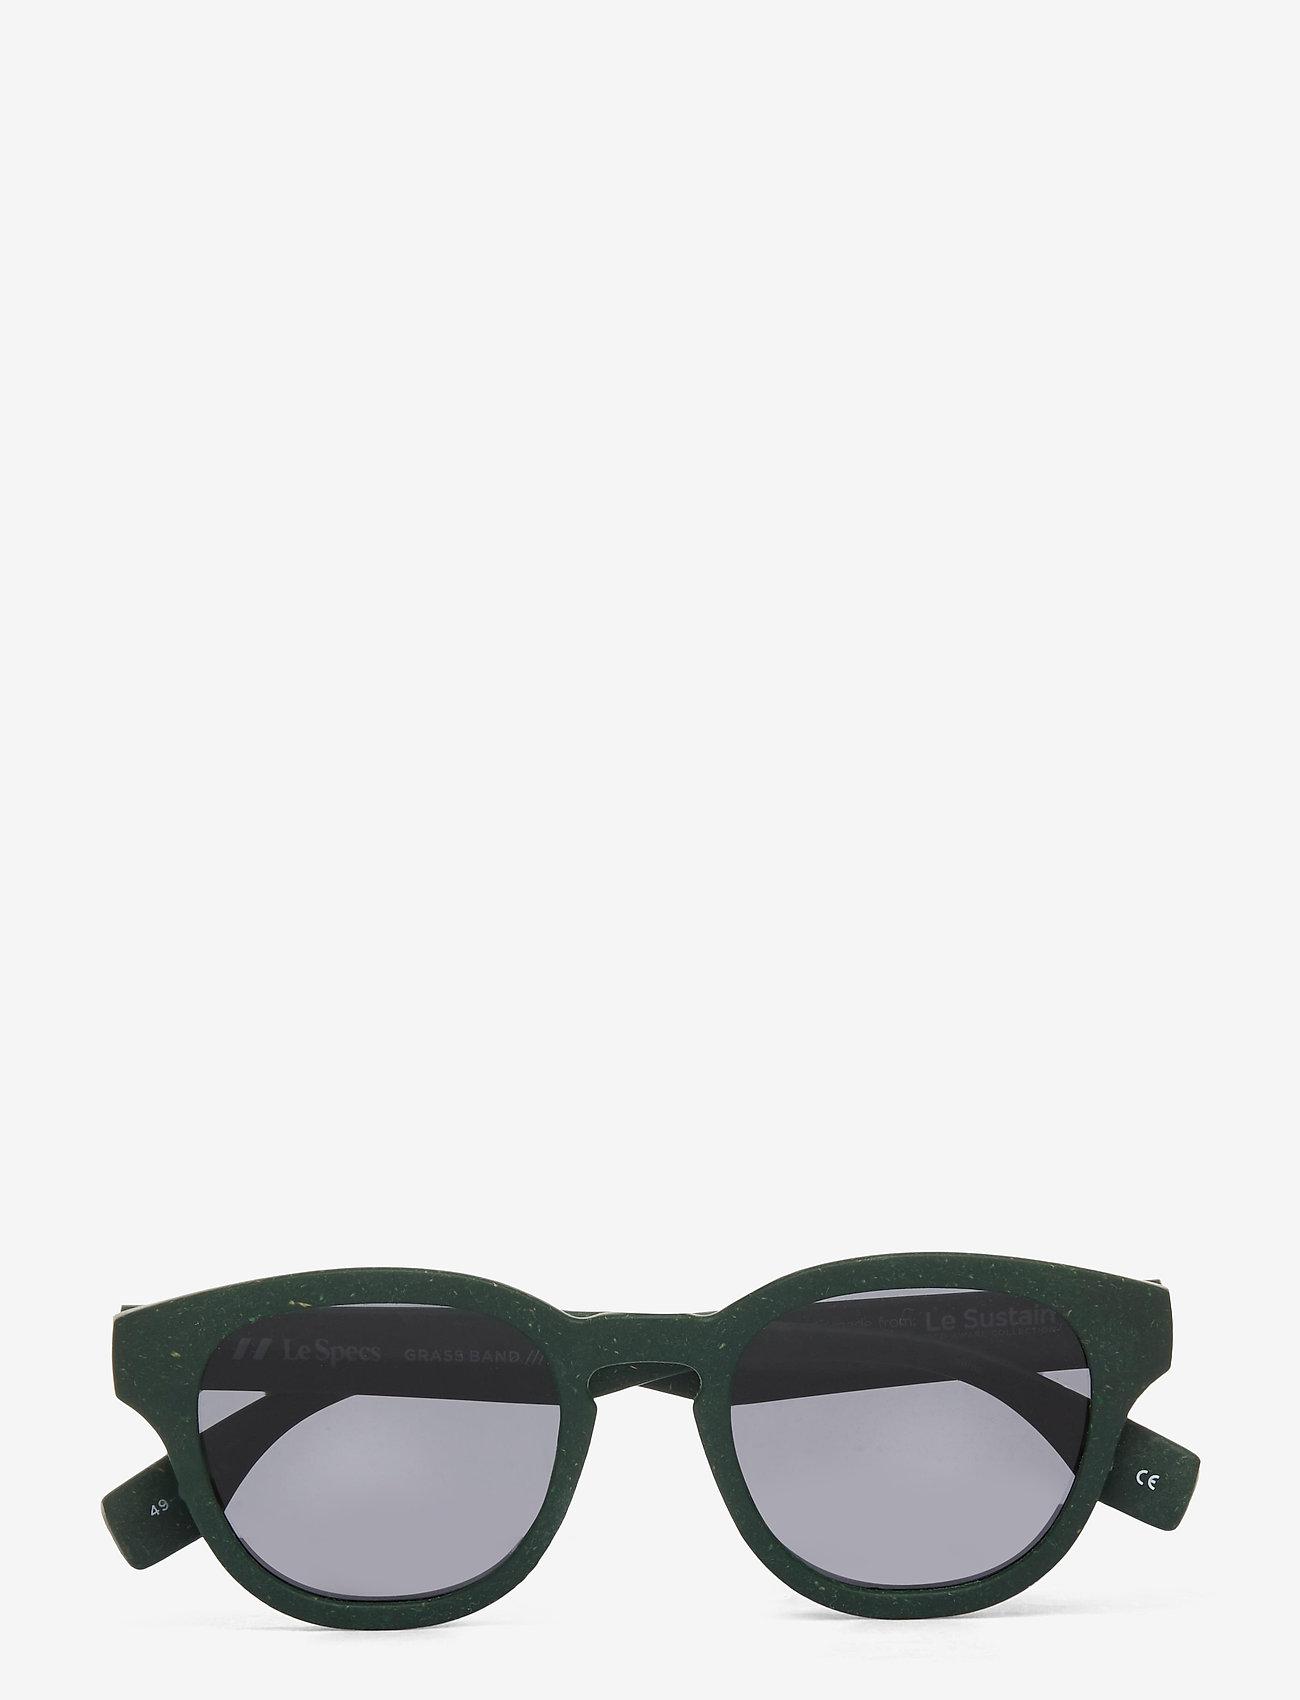 Le Specs - LE SUSTAIN - GRASS BAND - rond model - khaki grass w/ smoke mono lens - 0